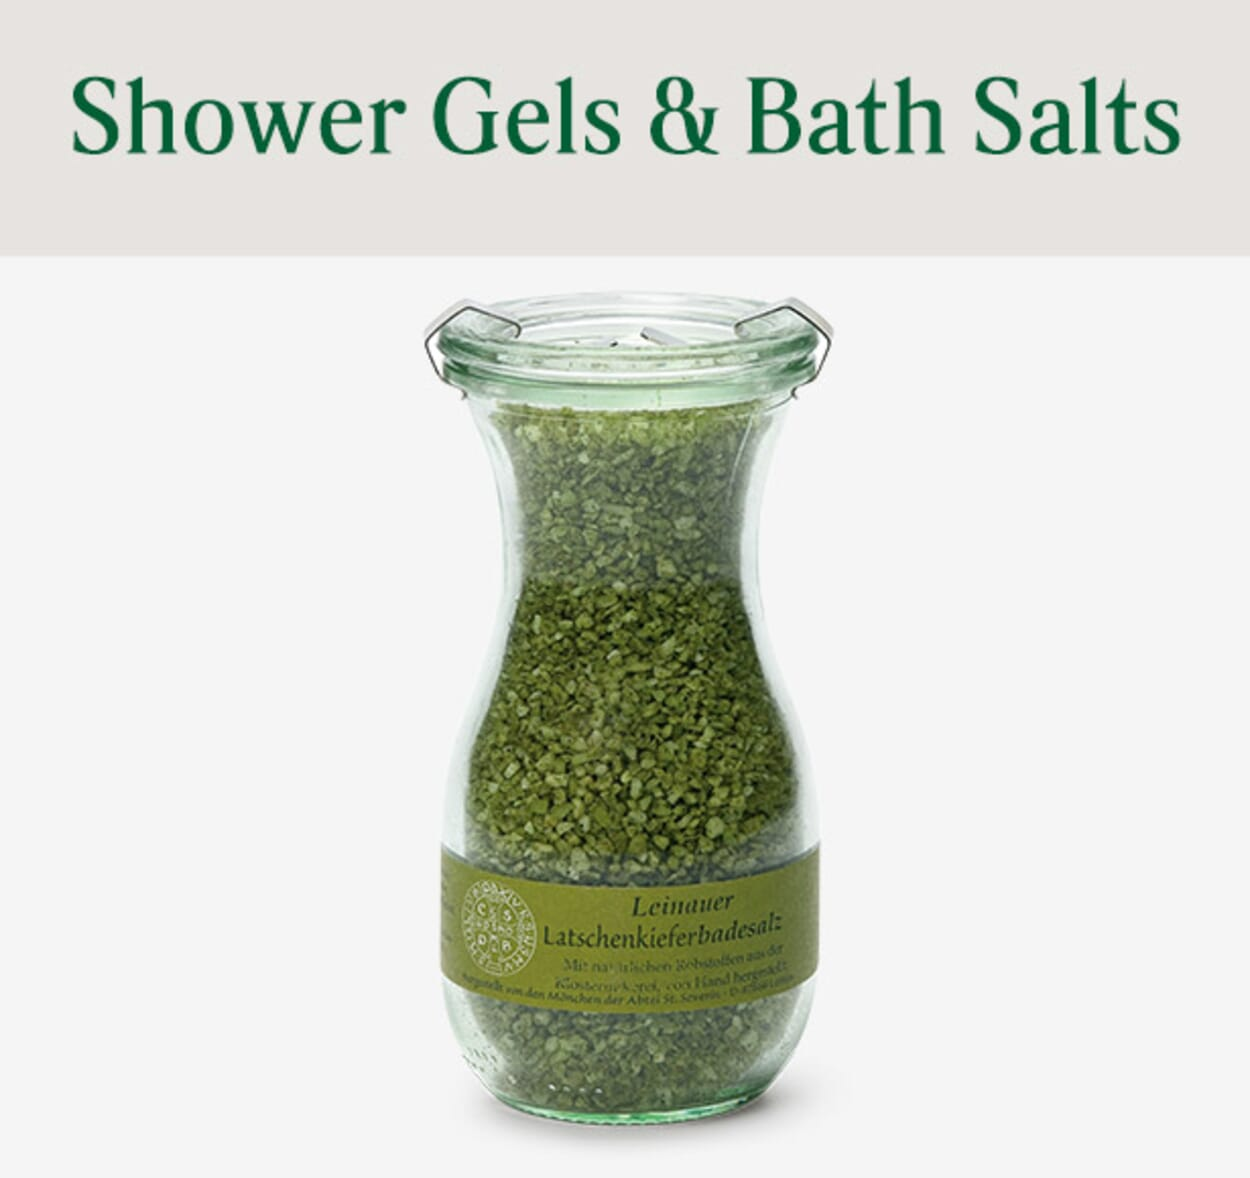 Shower Gels & Bath Salts